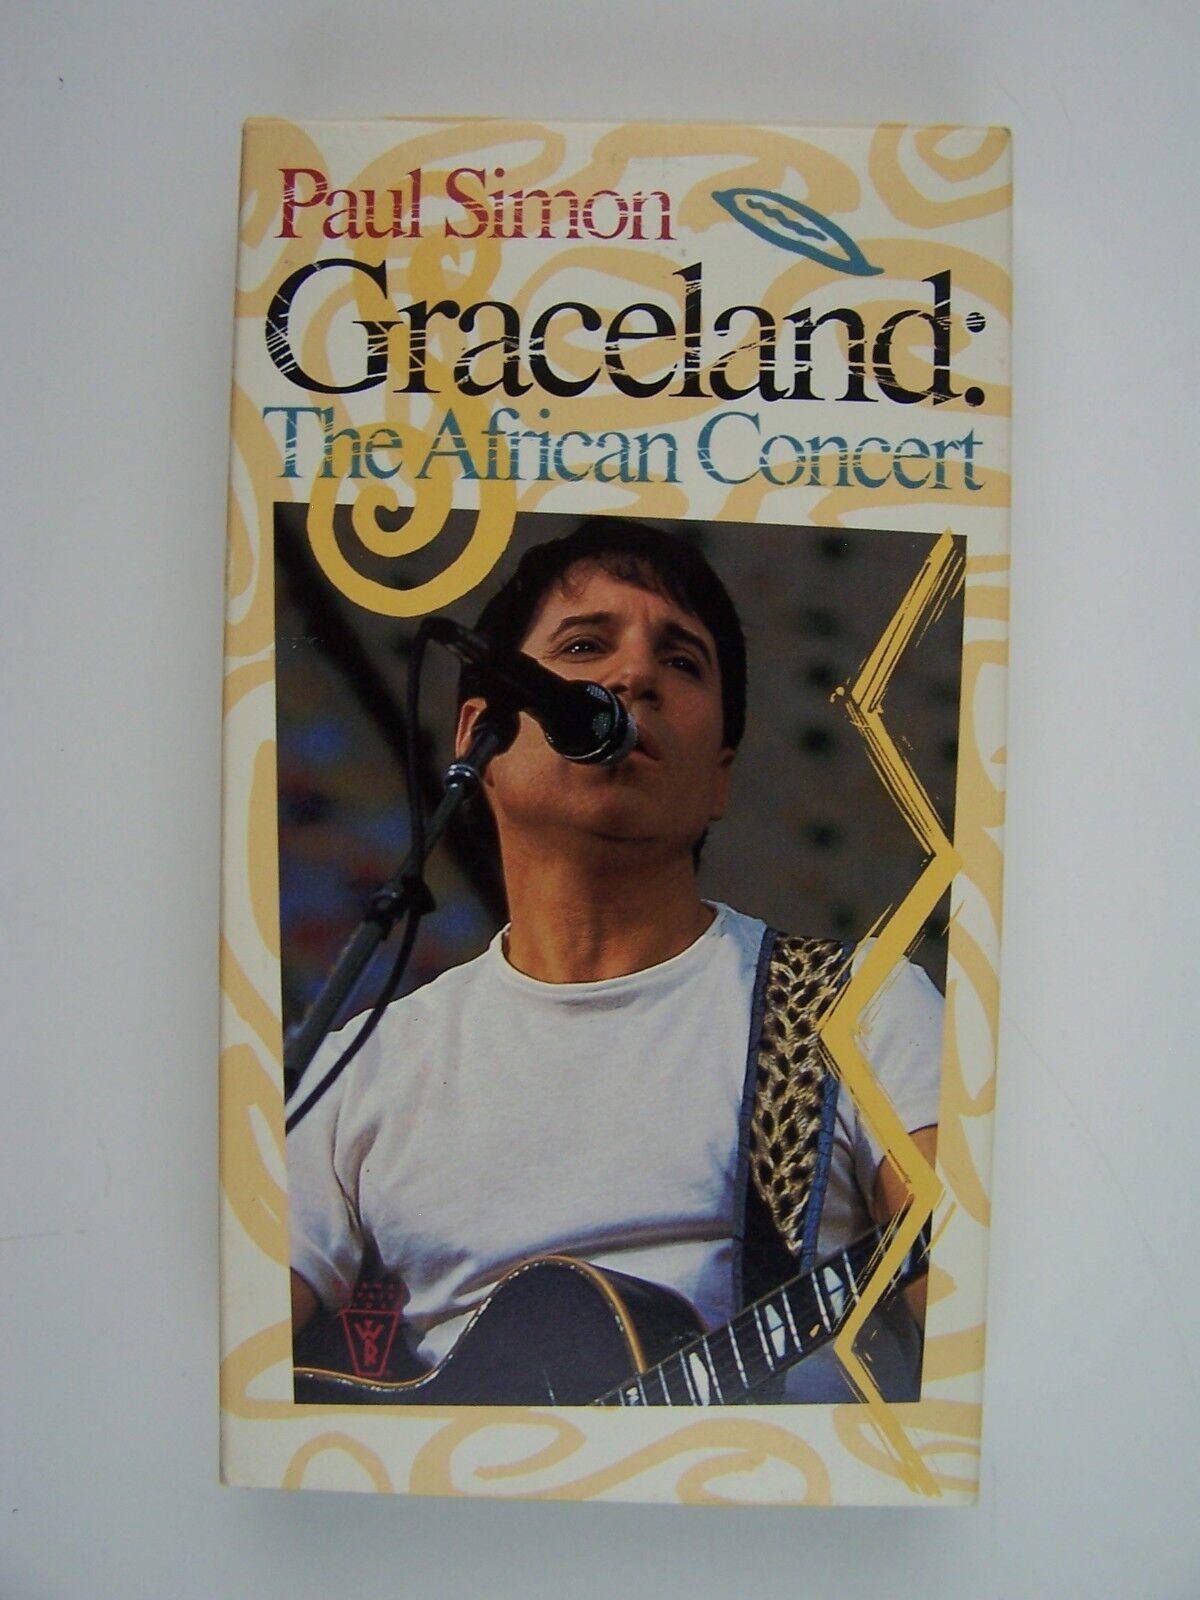 Paul Simon - Graceland - The African Concert (VHS, 1987